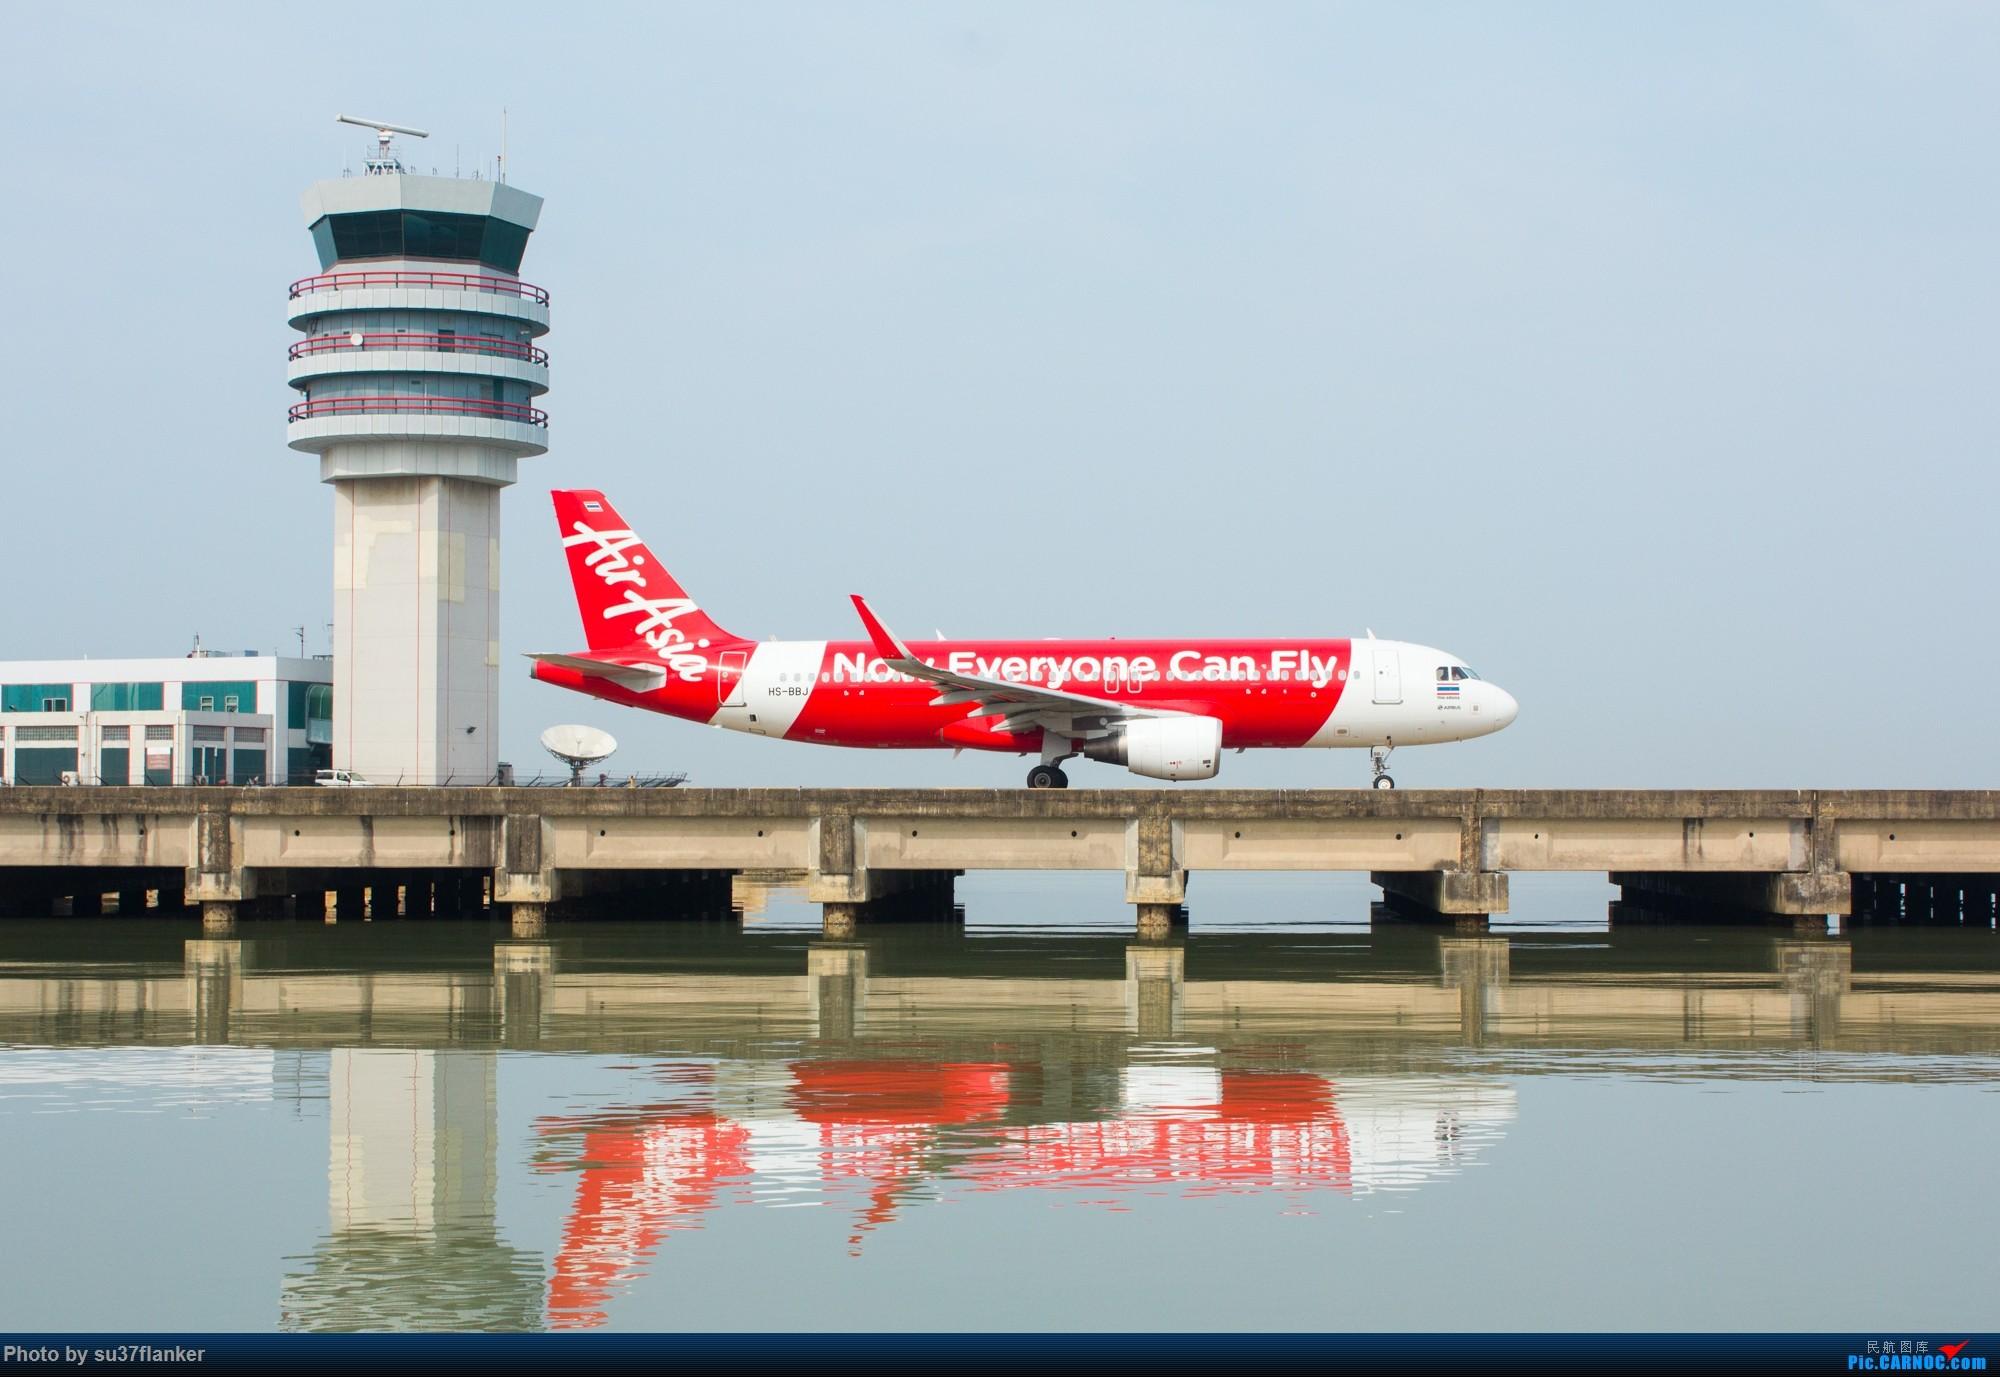 Re:[原创]【MFM】澳门机场拍机,多图多公司 AIRBUS A320-200 HS-BBJ 中国澳门国际机场